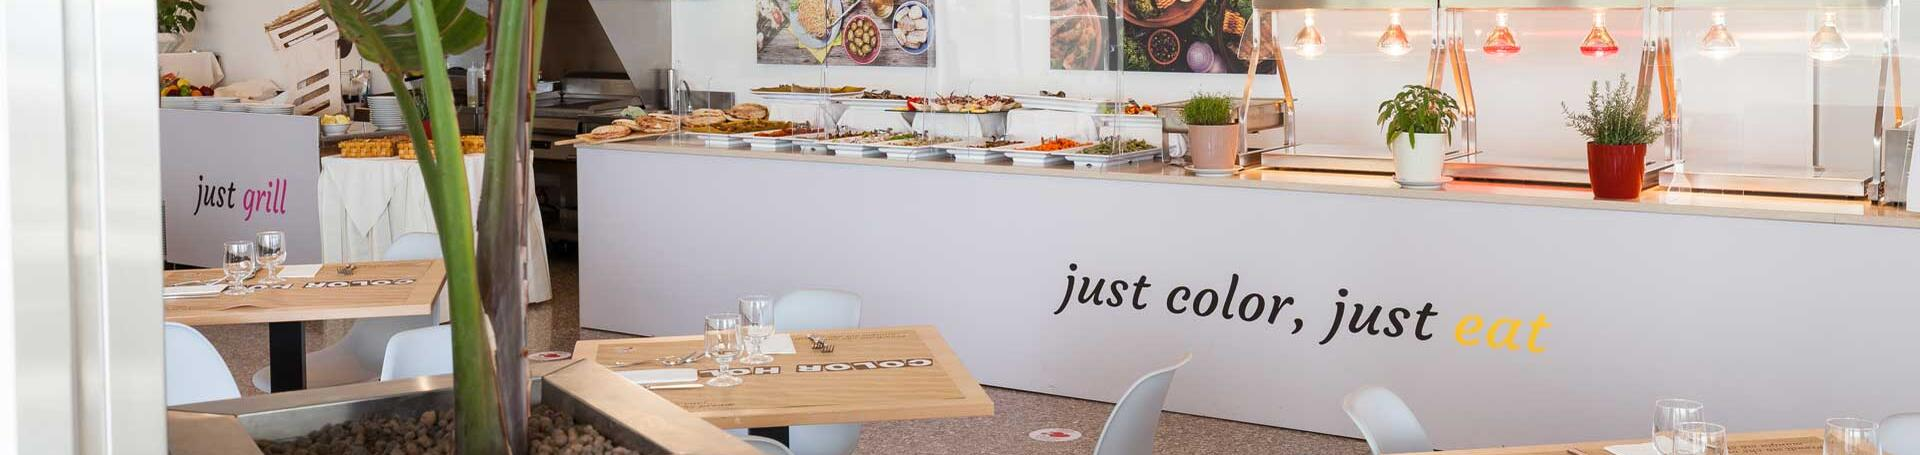 hotelmokambo fr restaurant-cesenatico 010